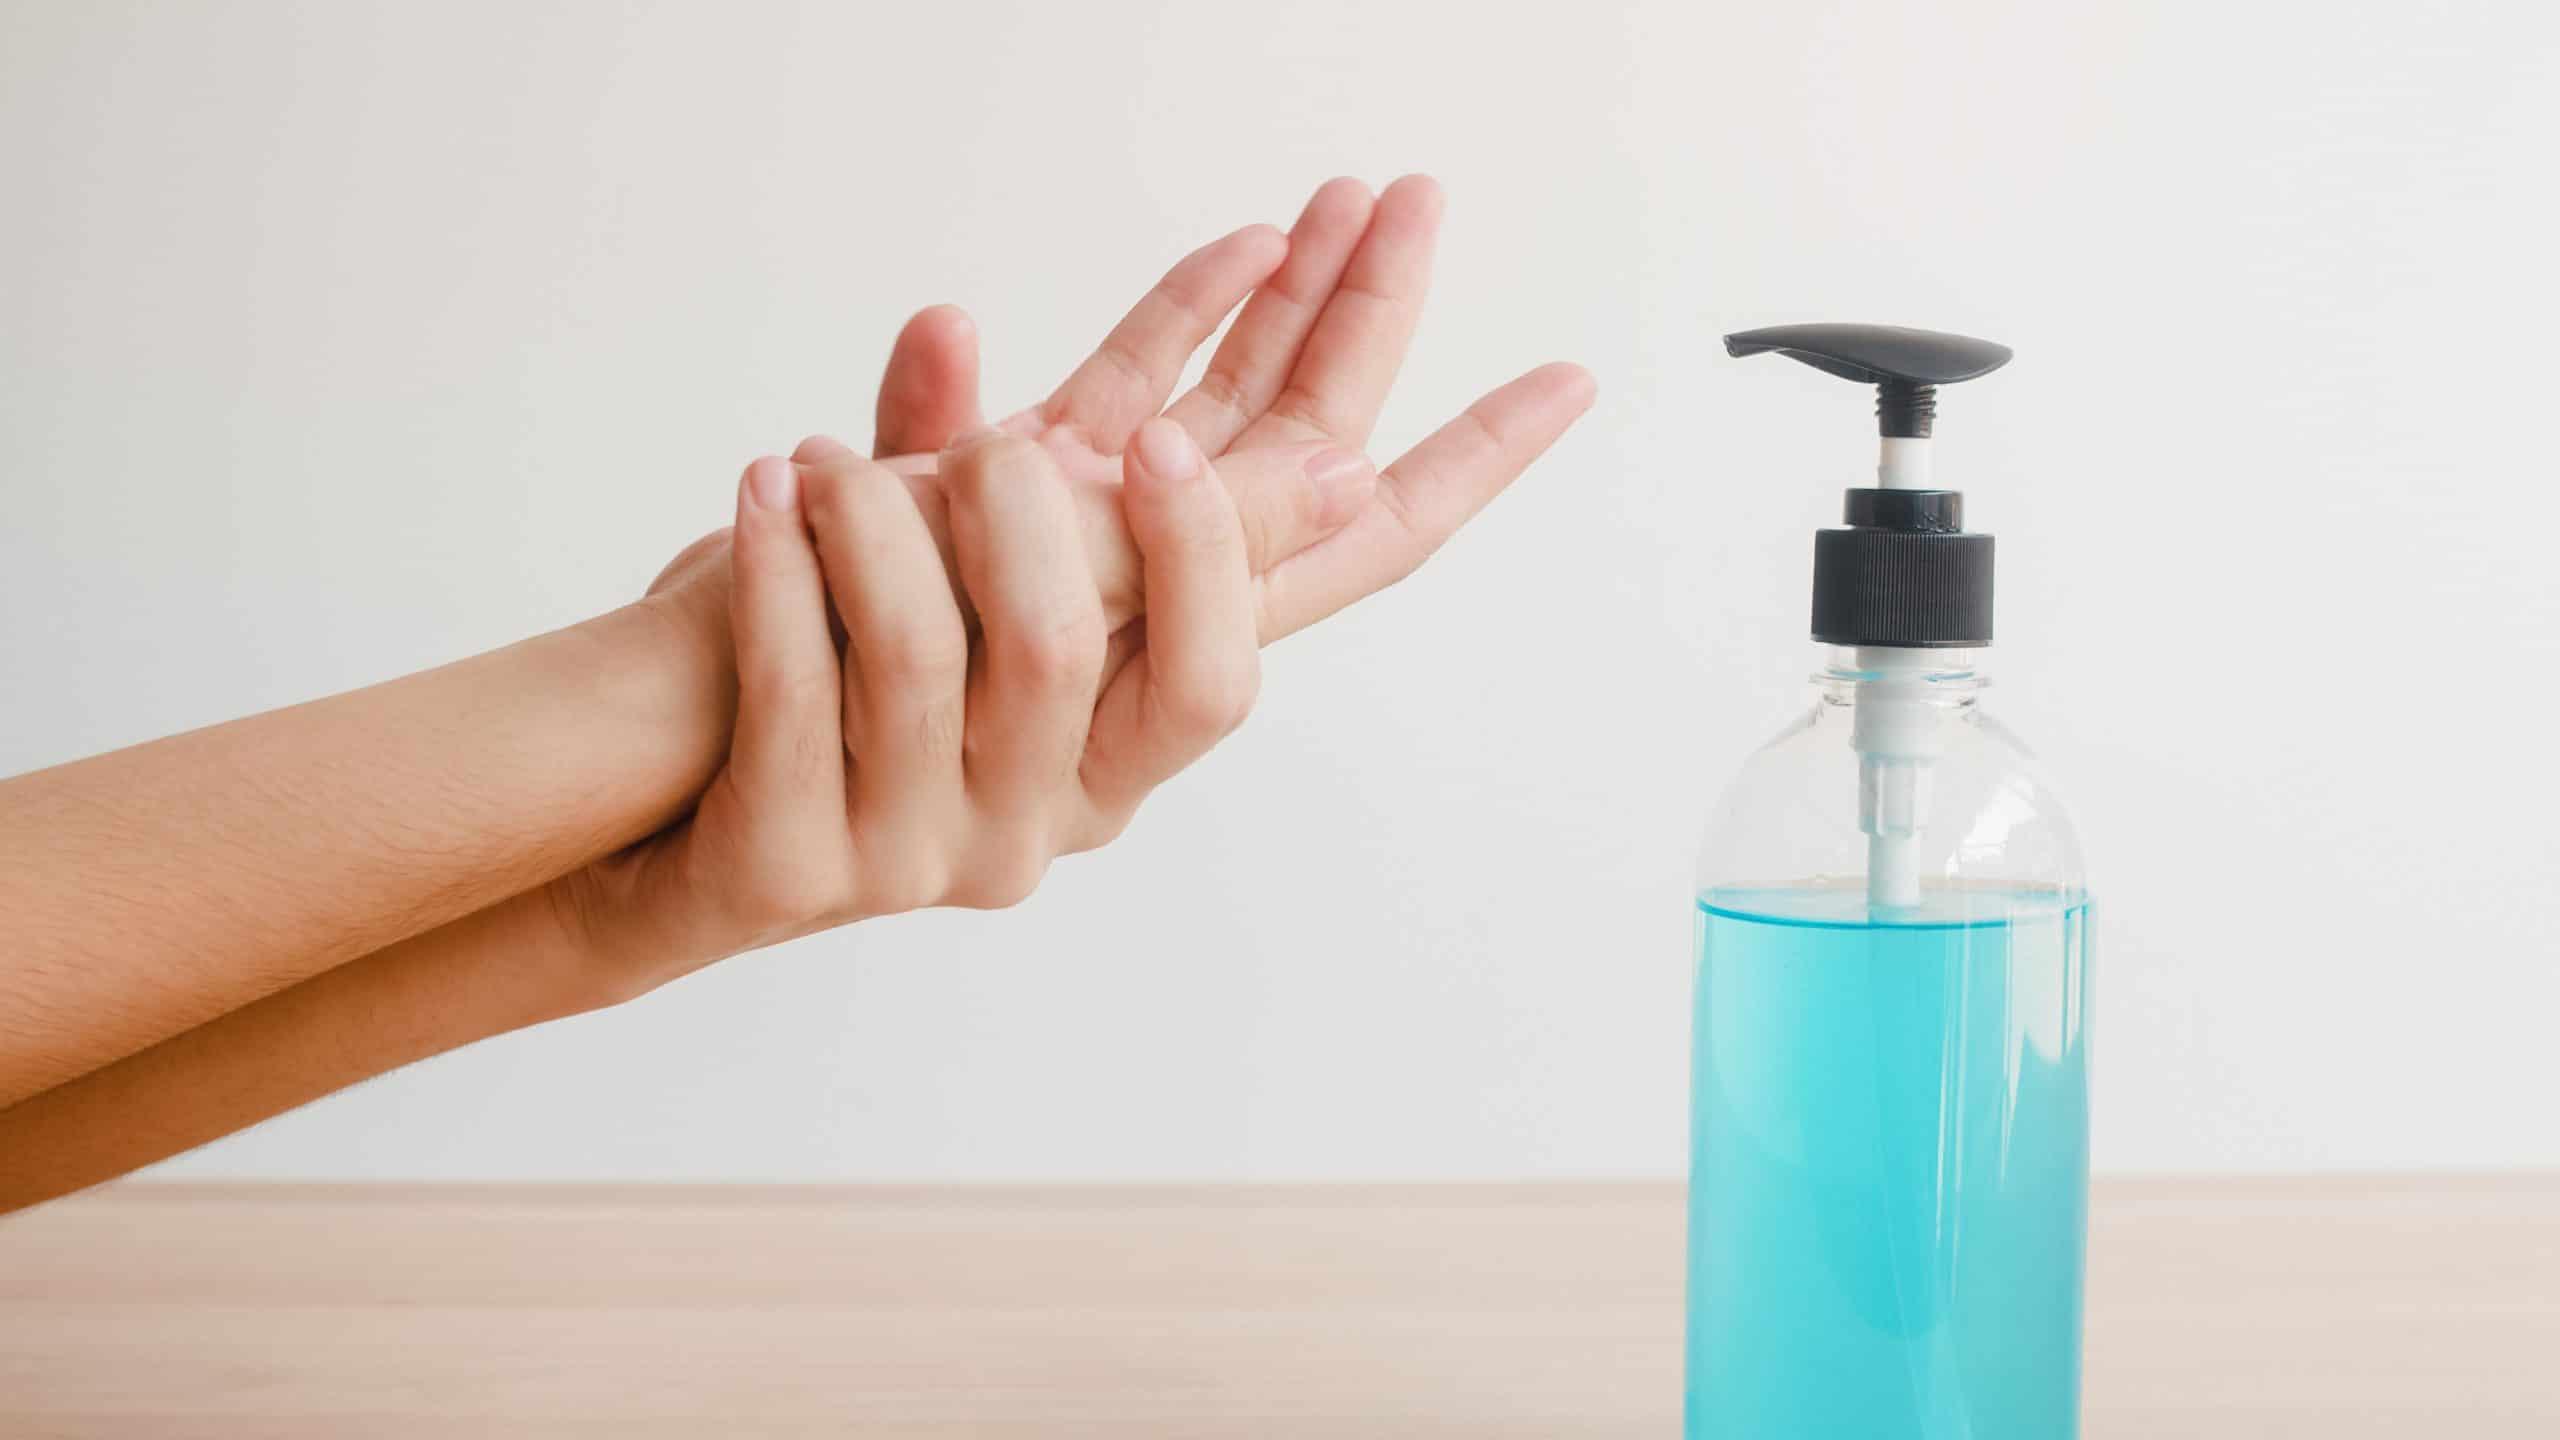 Gel antiseptico manos Higiene Alcaraz